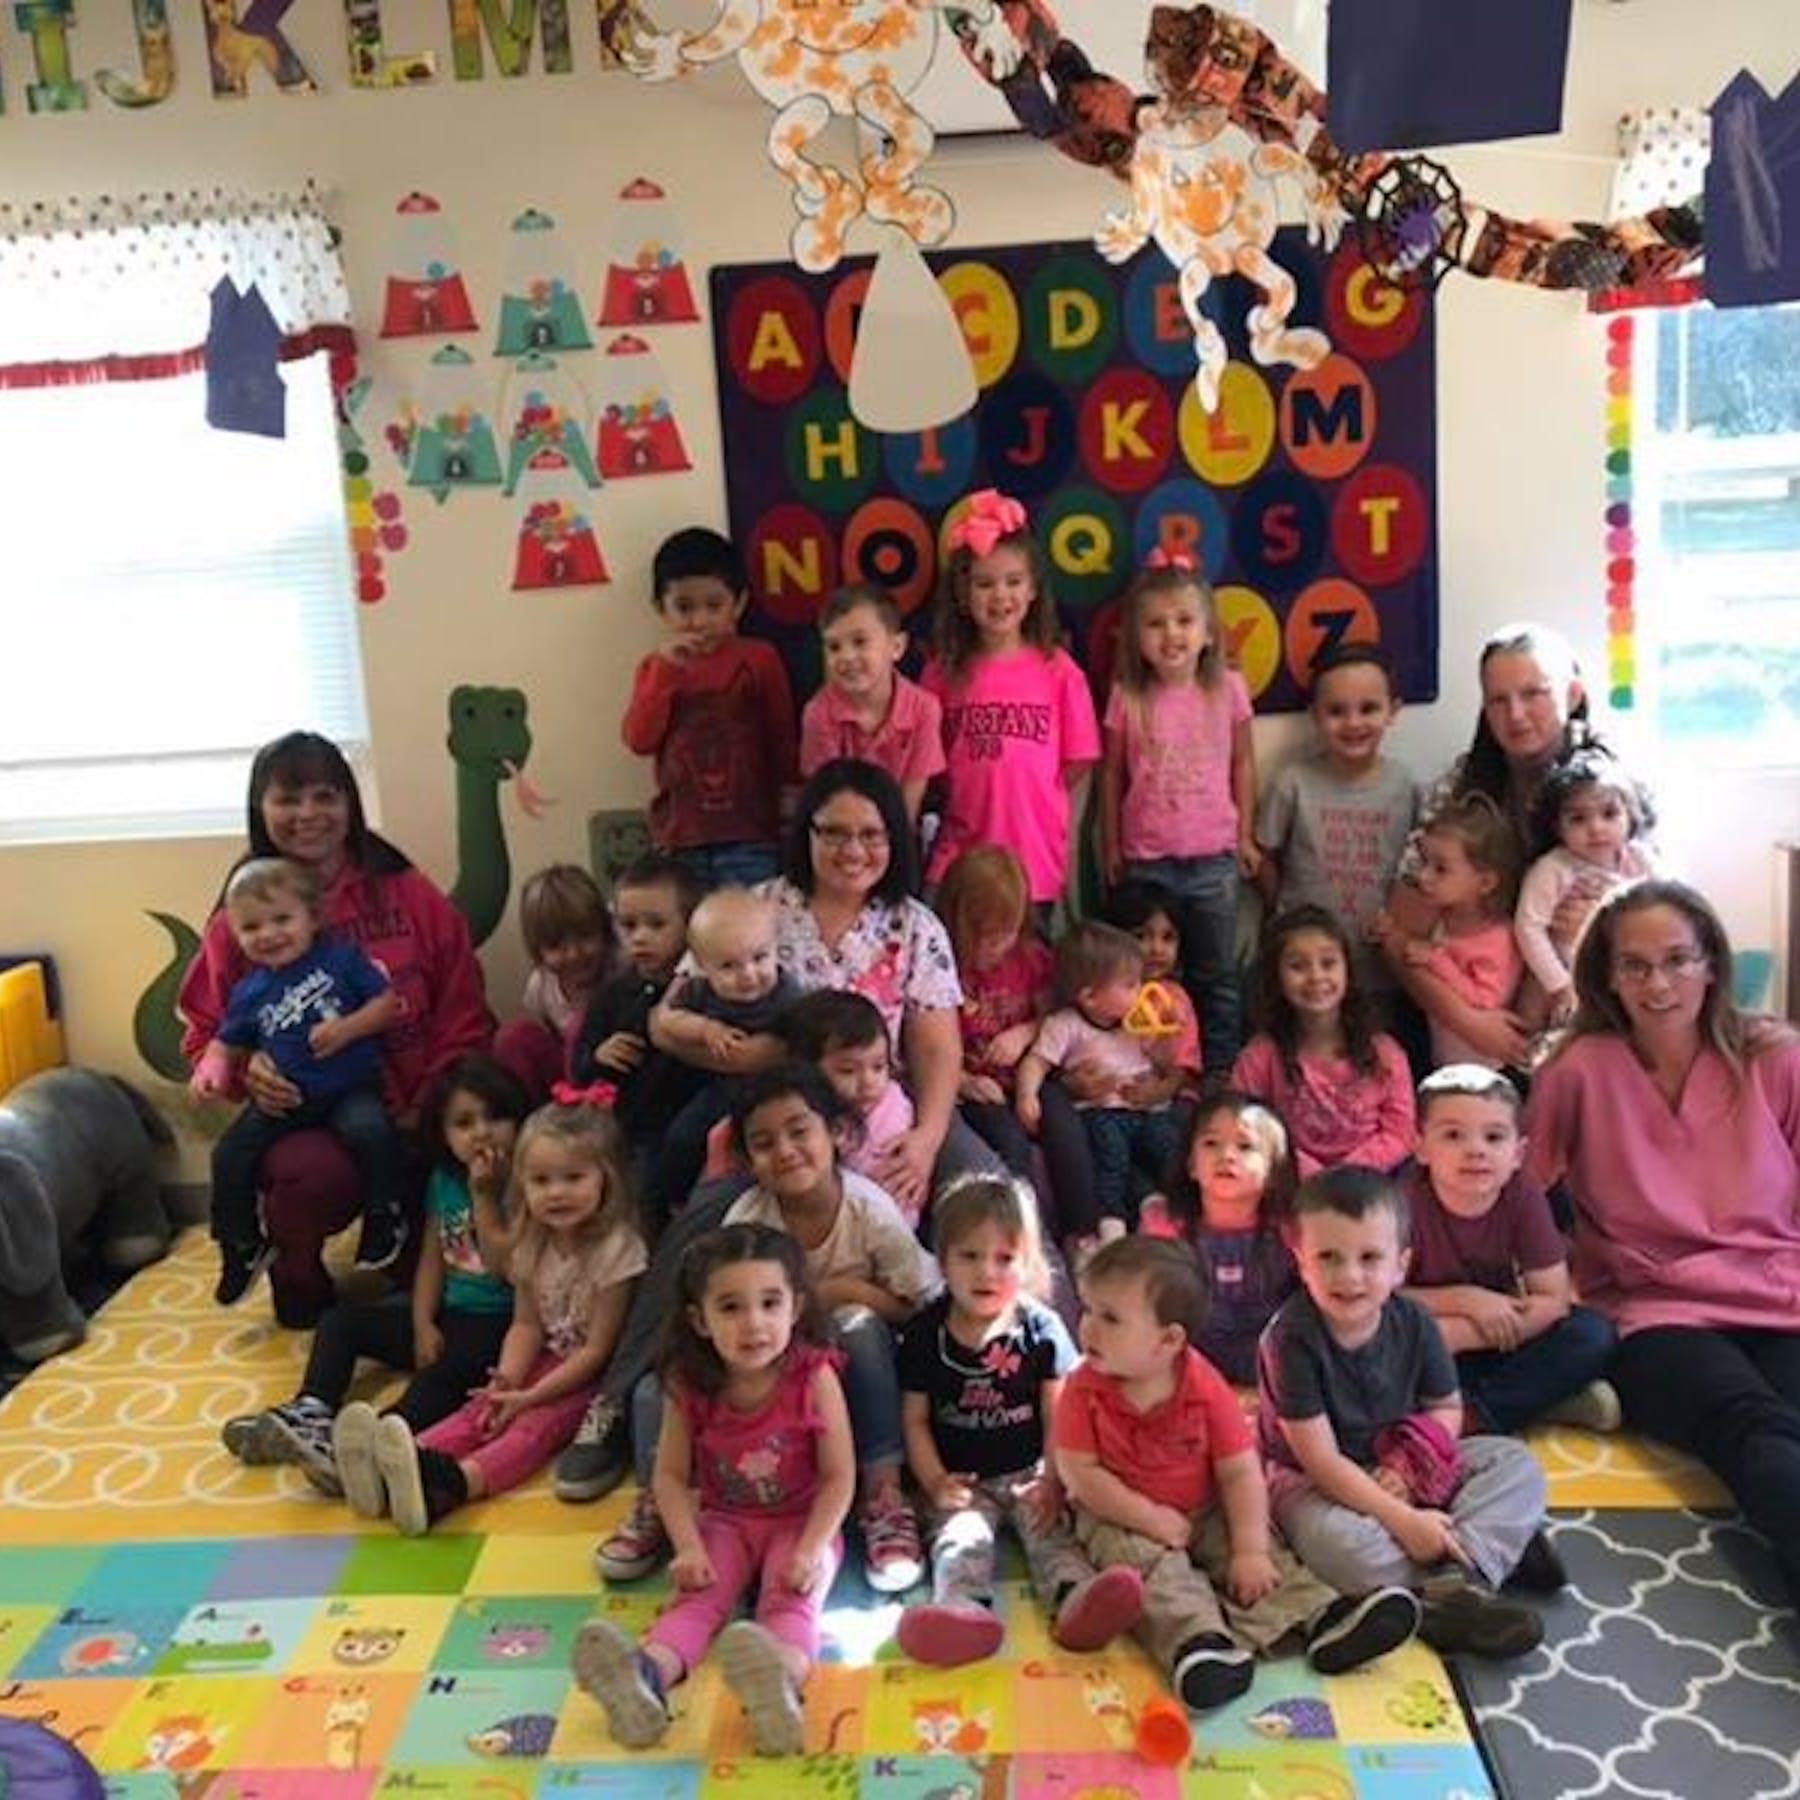 Ark Christian Preschool, The - Preschool in Yucaipa, CA - Winnie